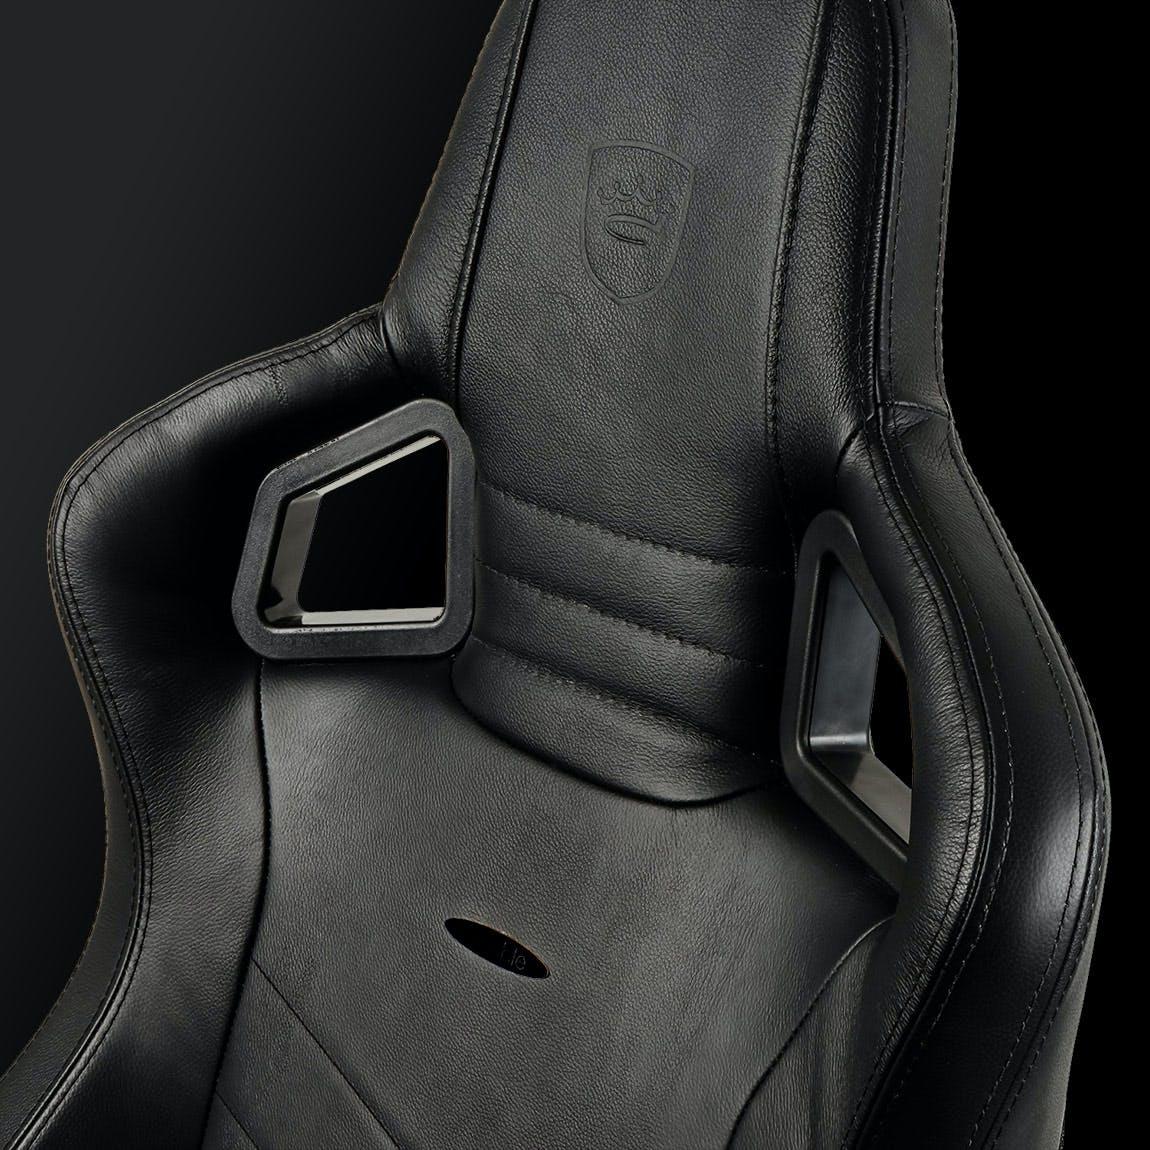 EPIC Real Leather Black / Black